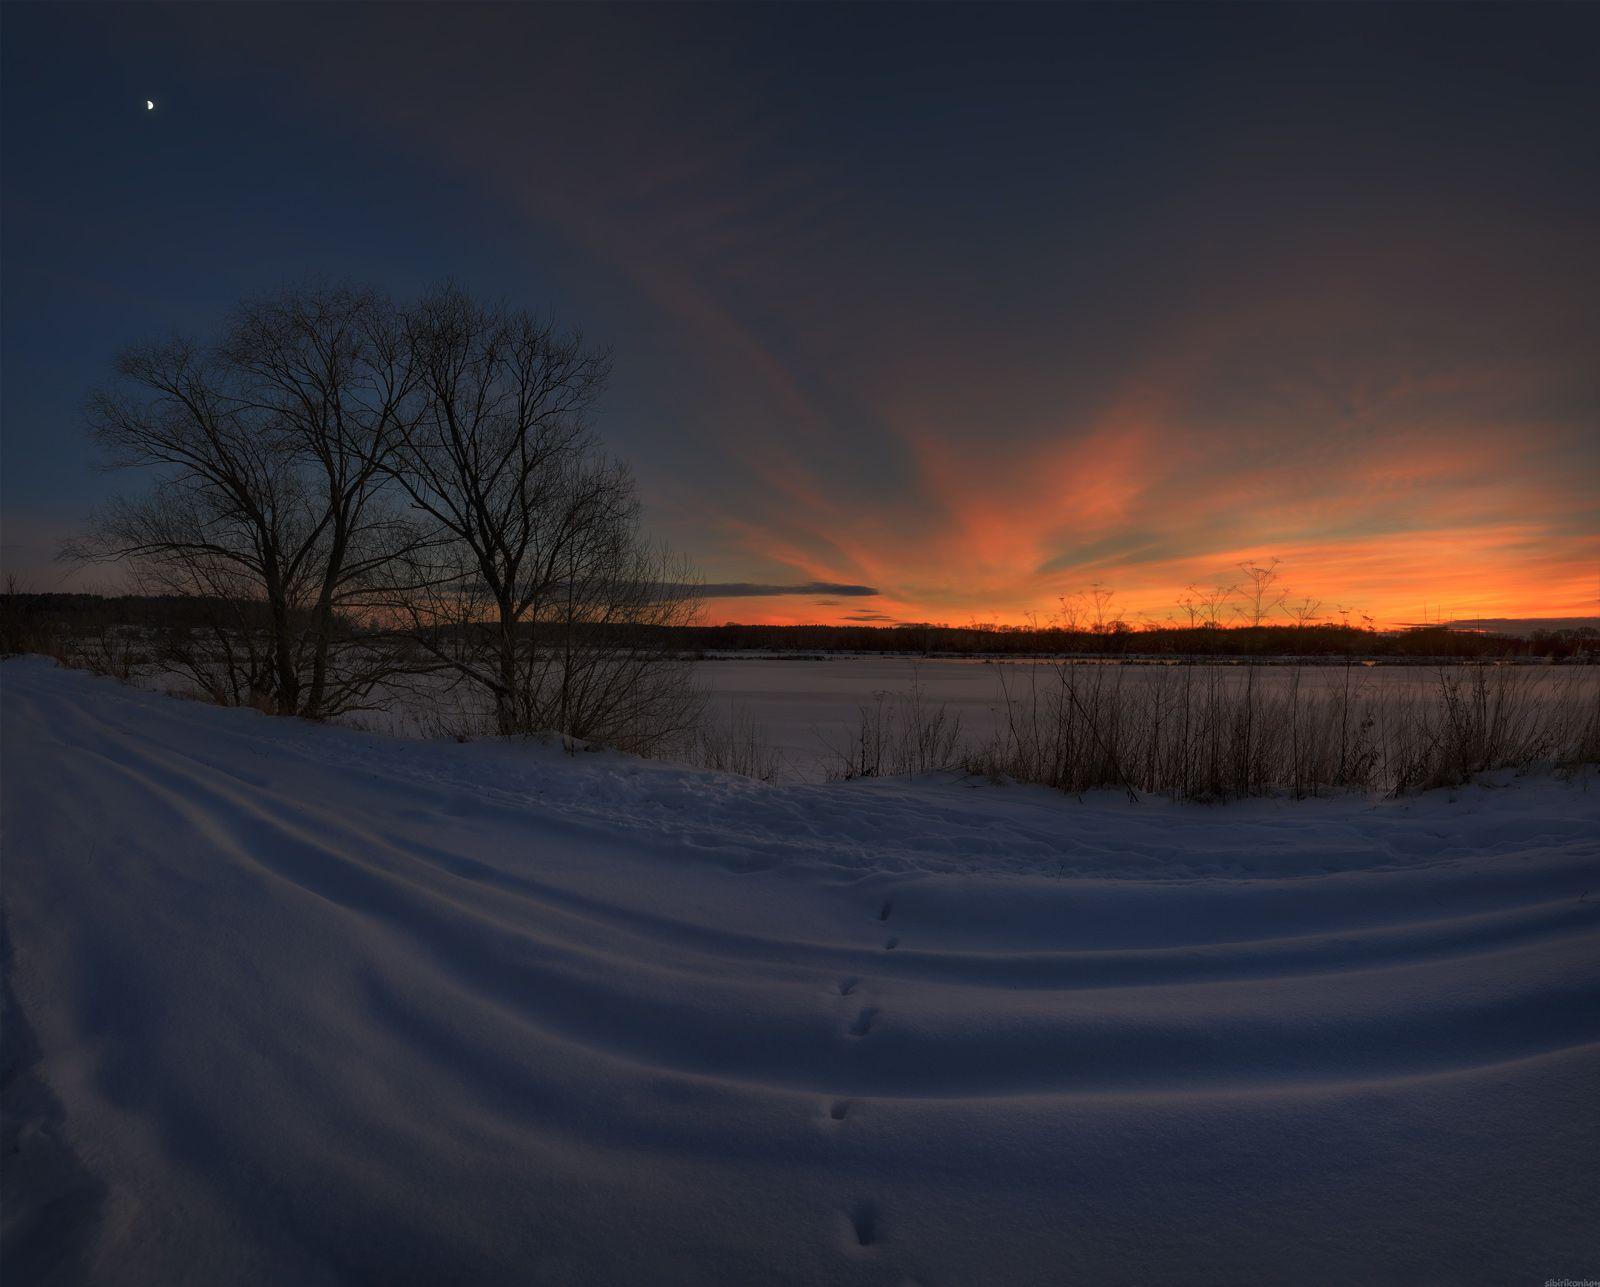 / В зимний вечер под Луной... / зима пейзаж луна вечер снег закат краски